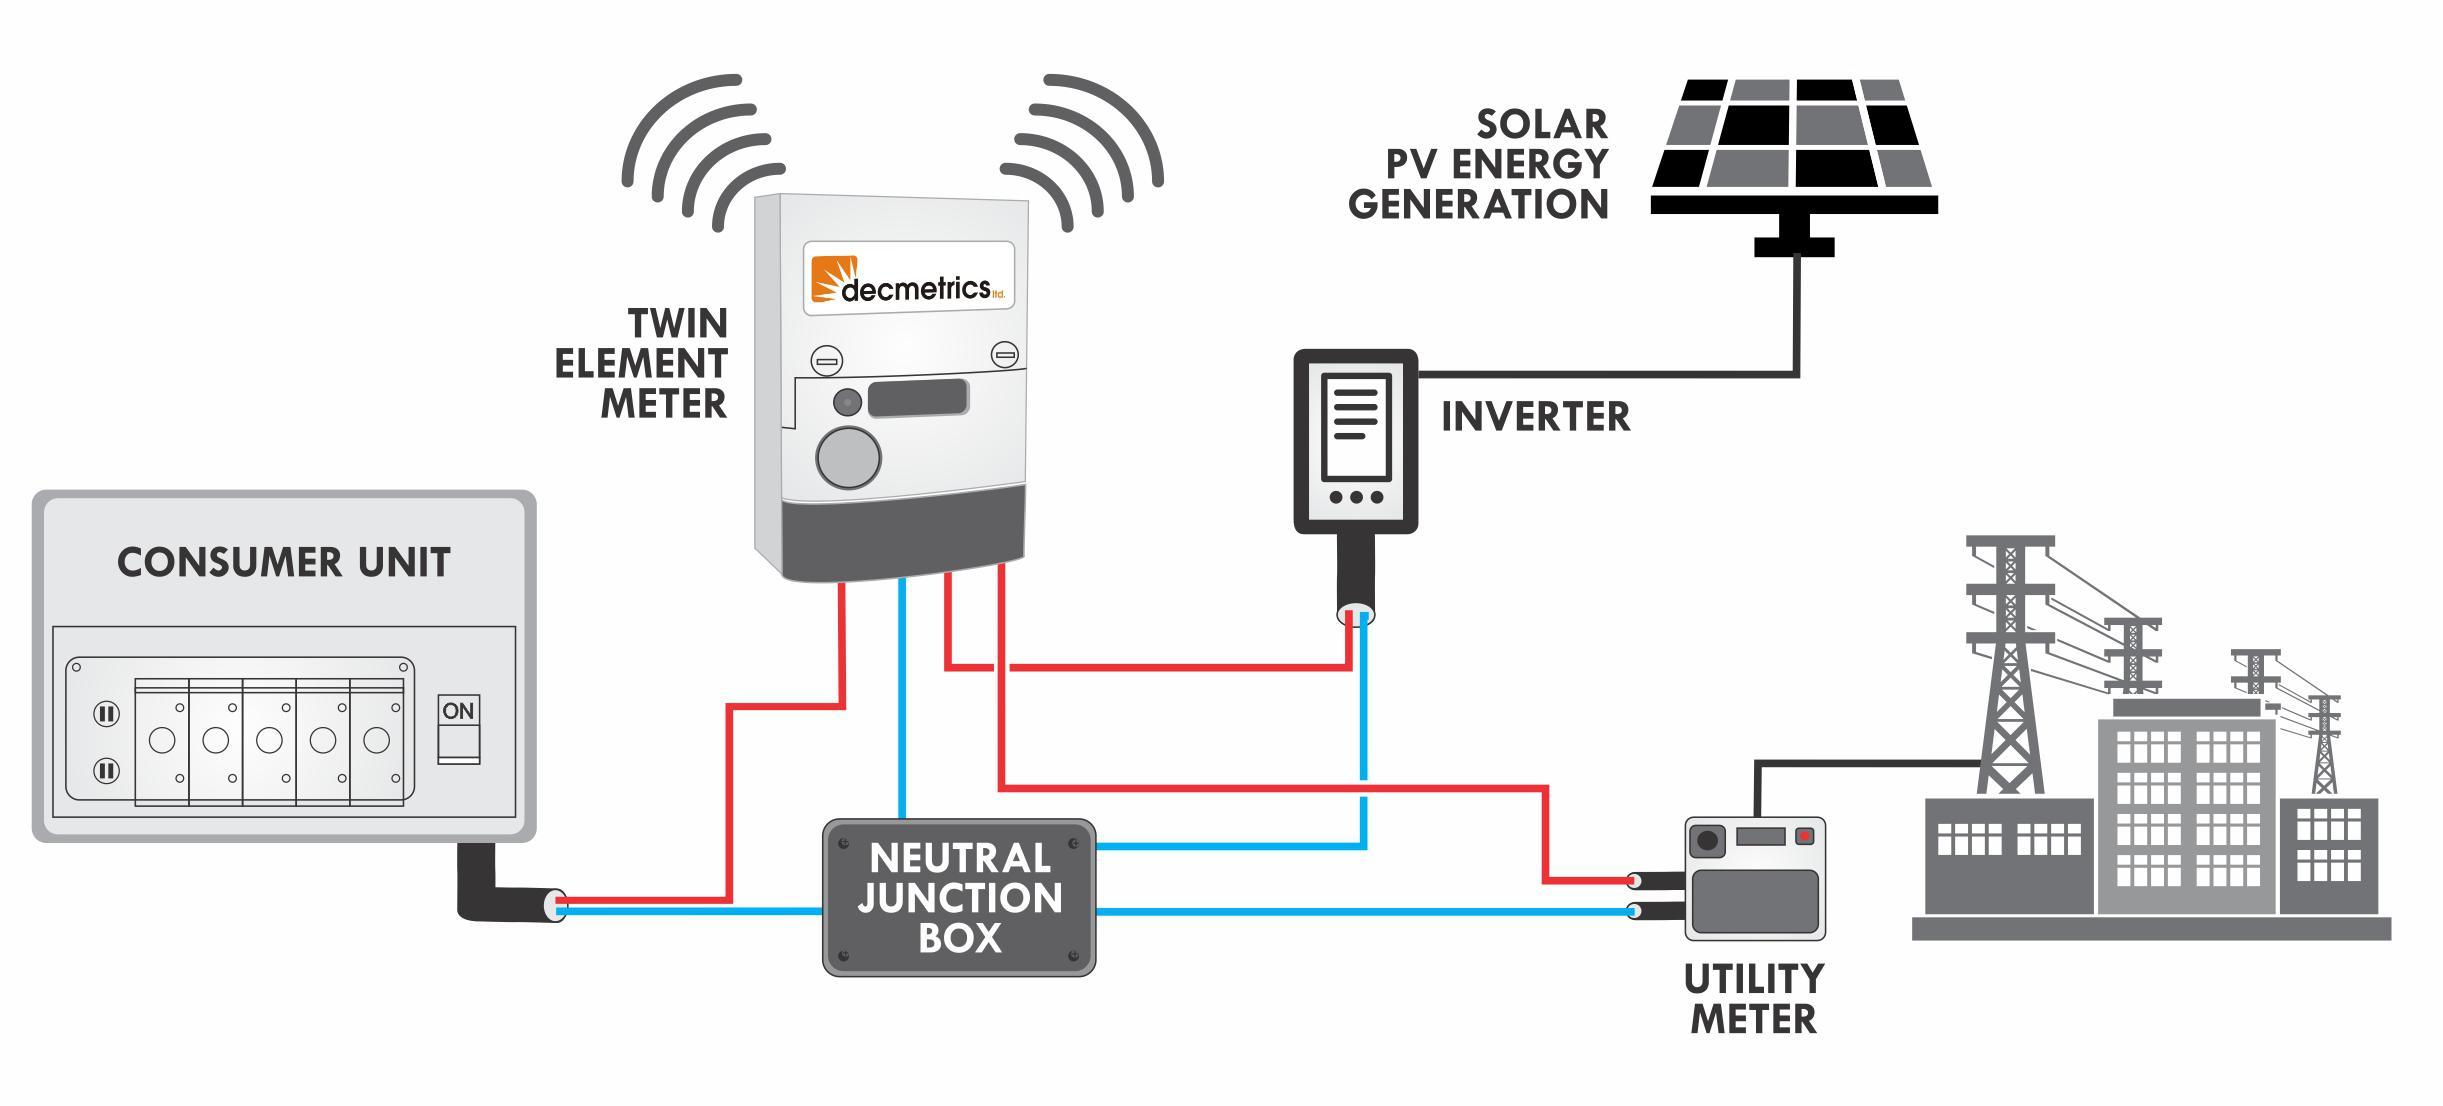 hight resolution of net metering wiring diagram wiring diagrams favoritessolar pv solar pv net metering schematic diagram solar net